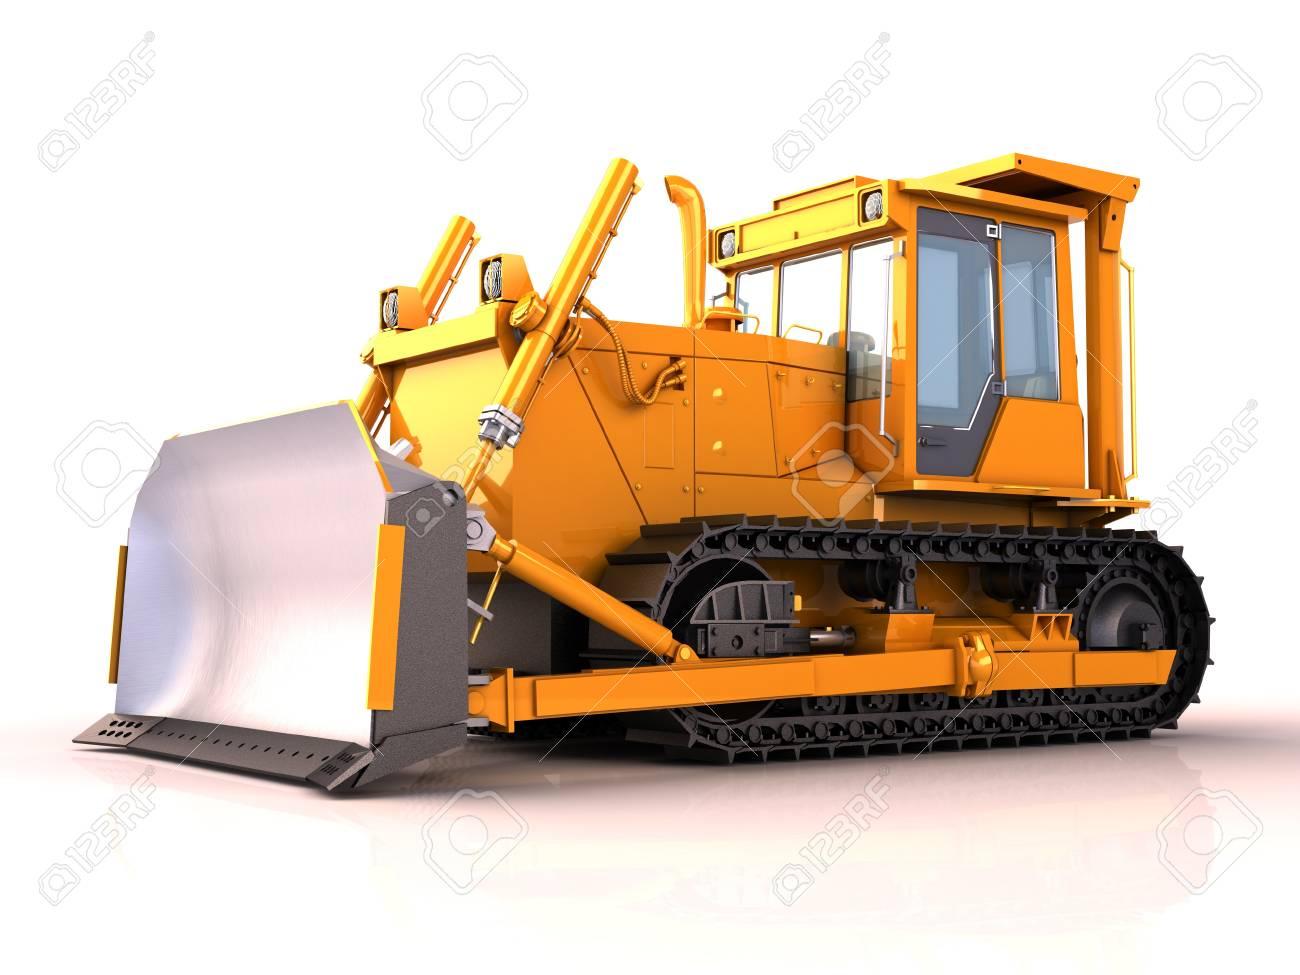 Bulldozer isolated Stock Photo - 15805551